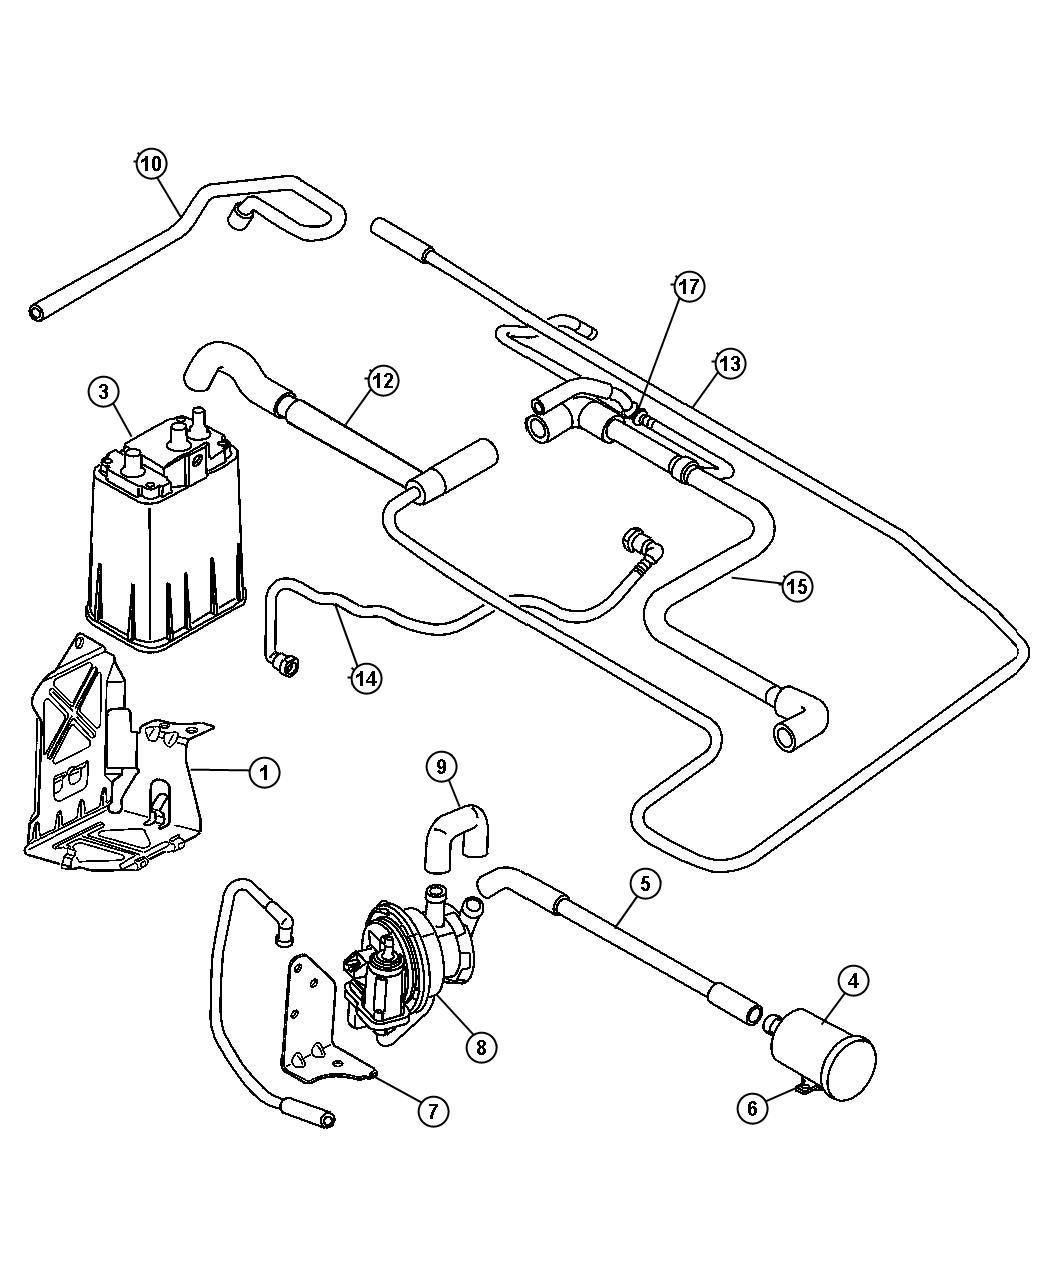 chrysler pt cruiser detector  natural vacuum leak detection  capemissions  tankelectronic